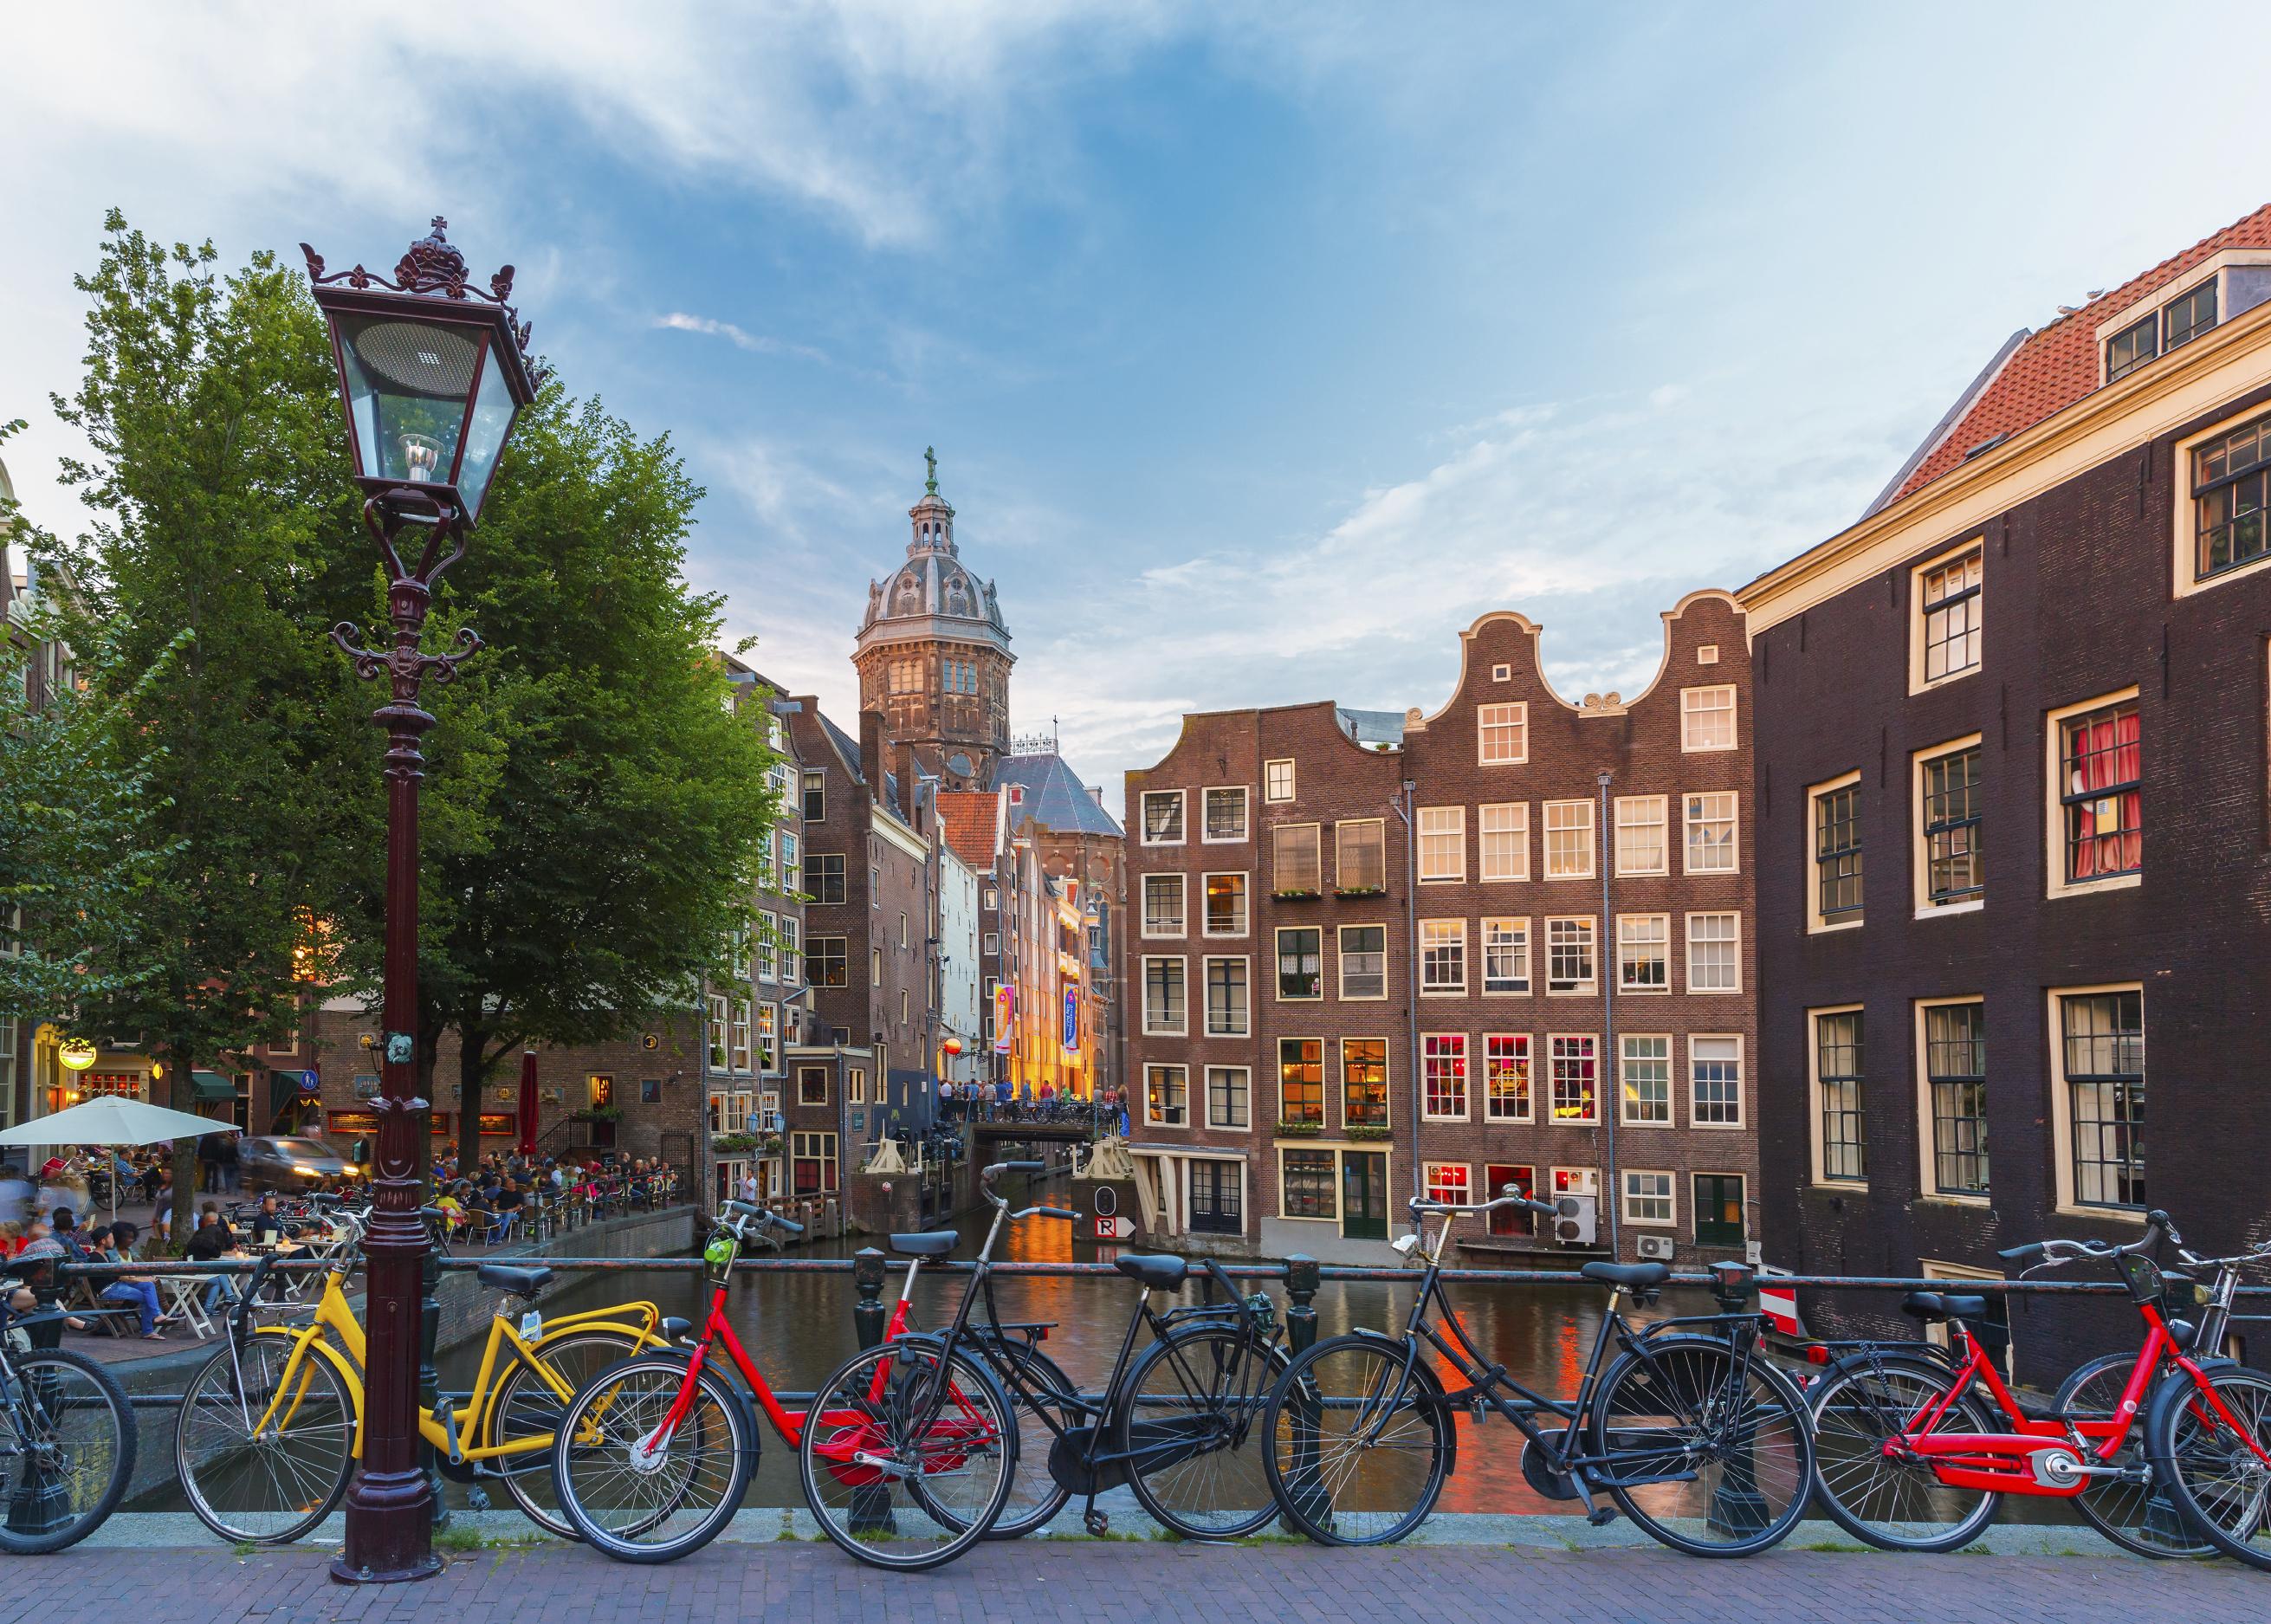 2-14 Day Prague, Budapest, Vienna, Amsterdam, Paris Europe Explorer Flexible Tour from Prague in English